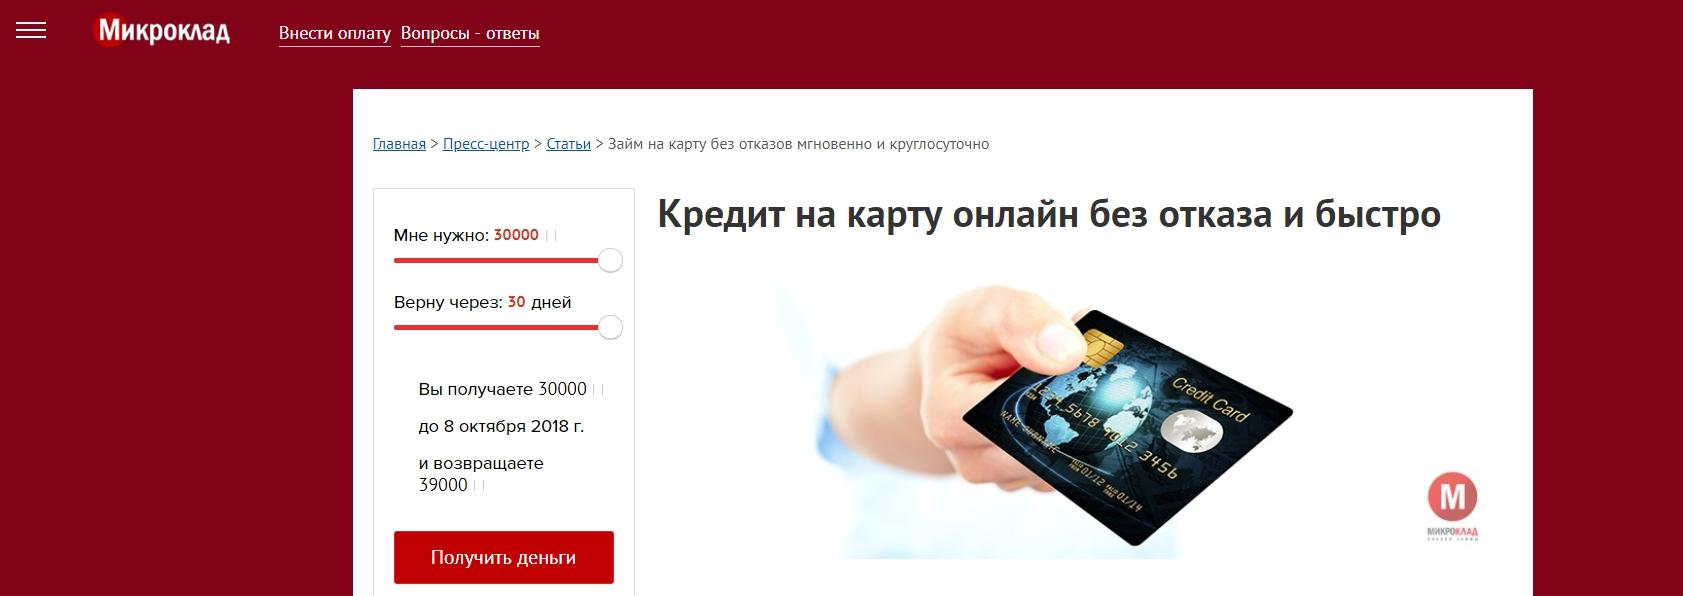 zajm-na-kartu-onlajn-bez-otkaza_17